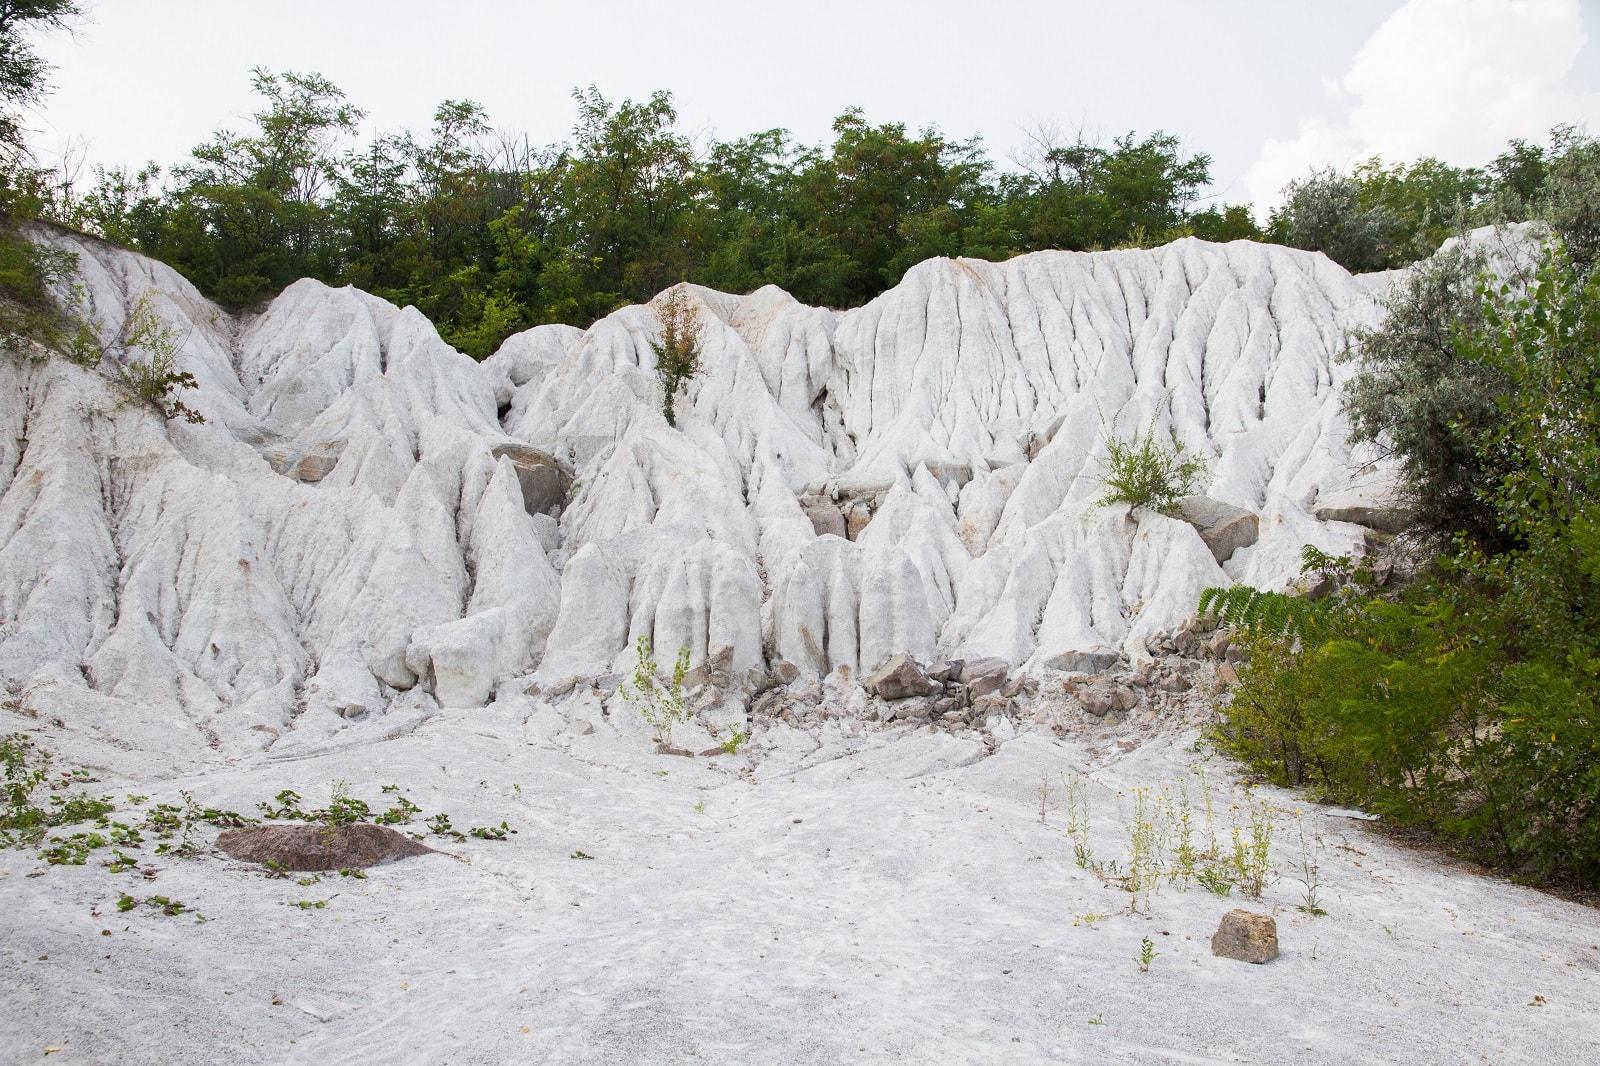 Білі вапнякові скелі